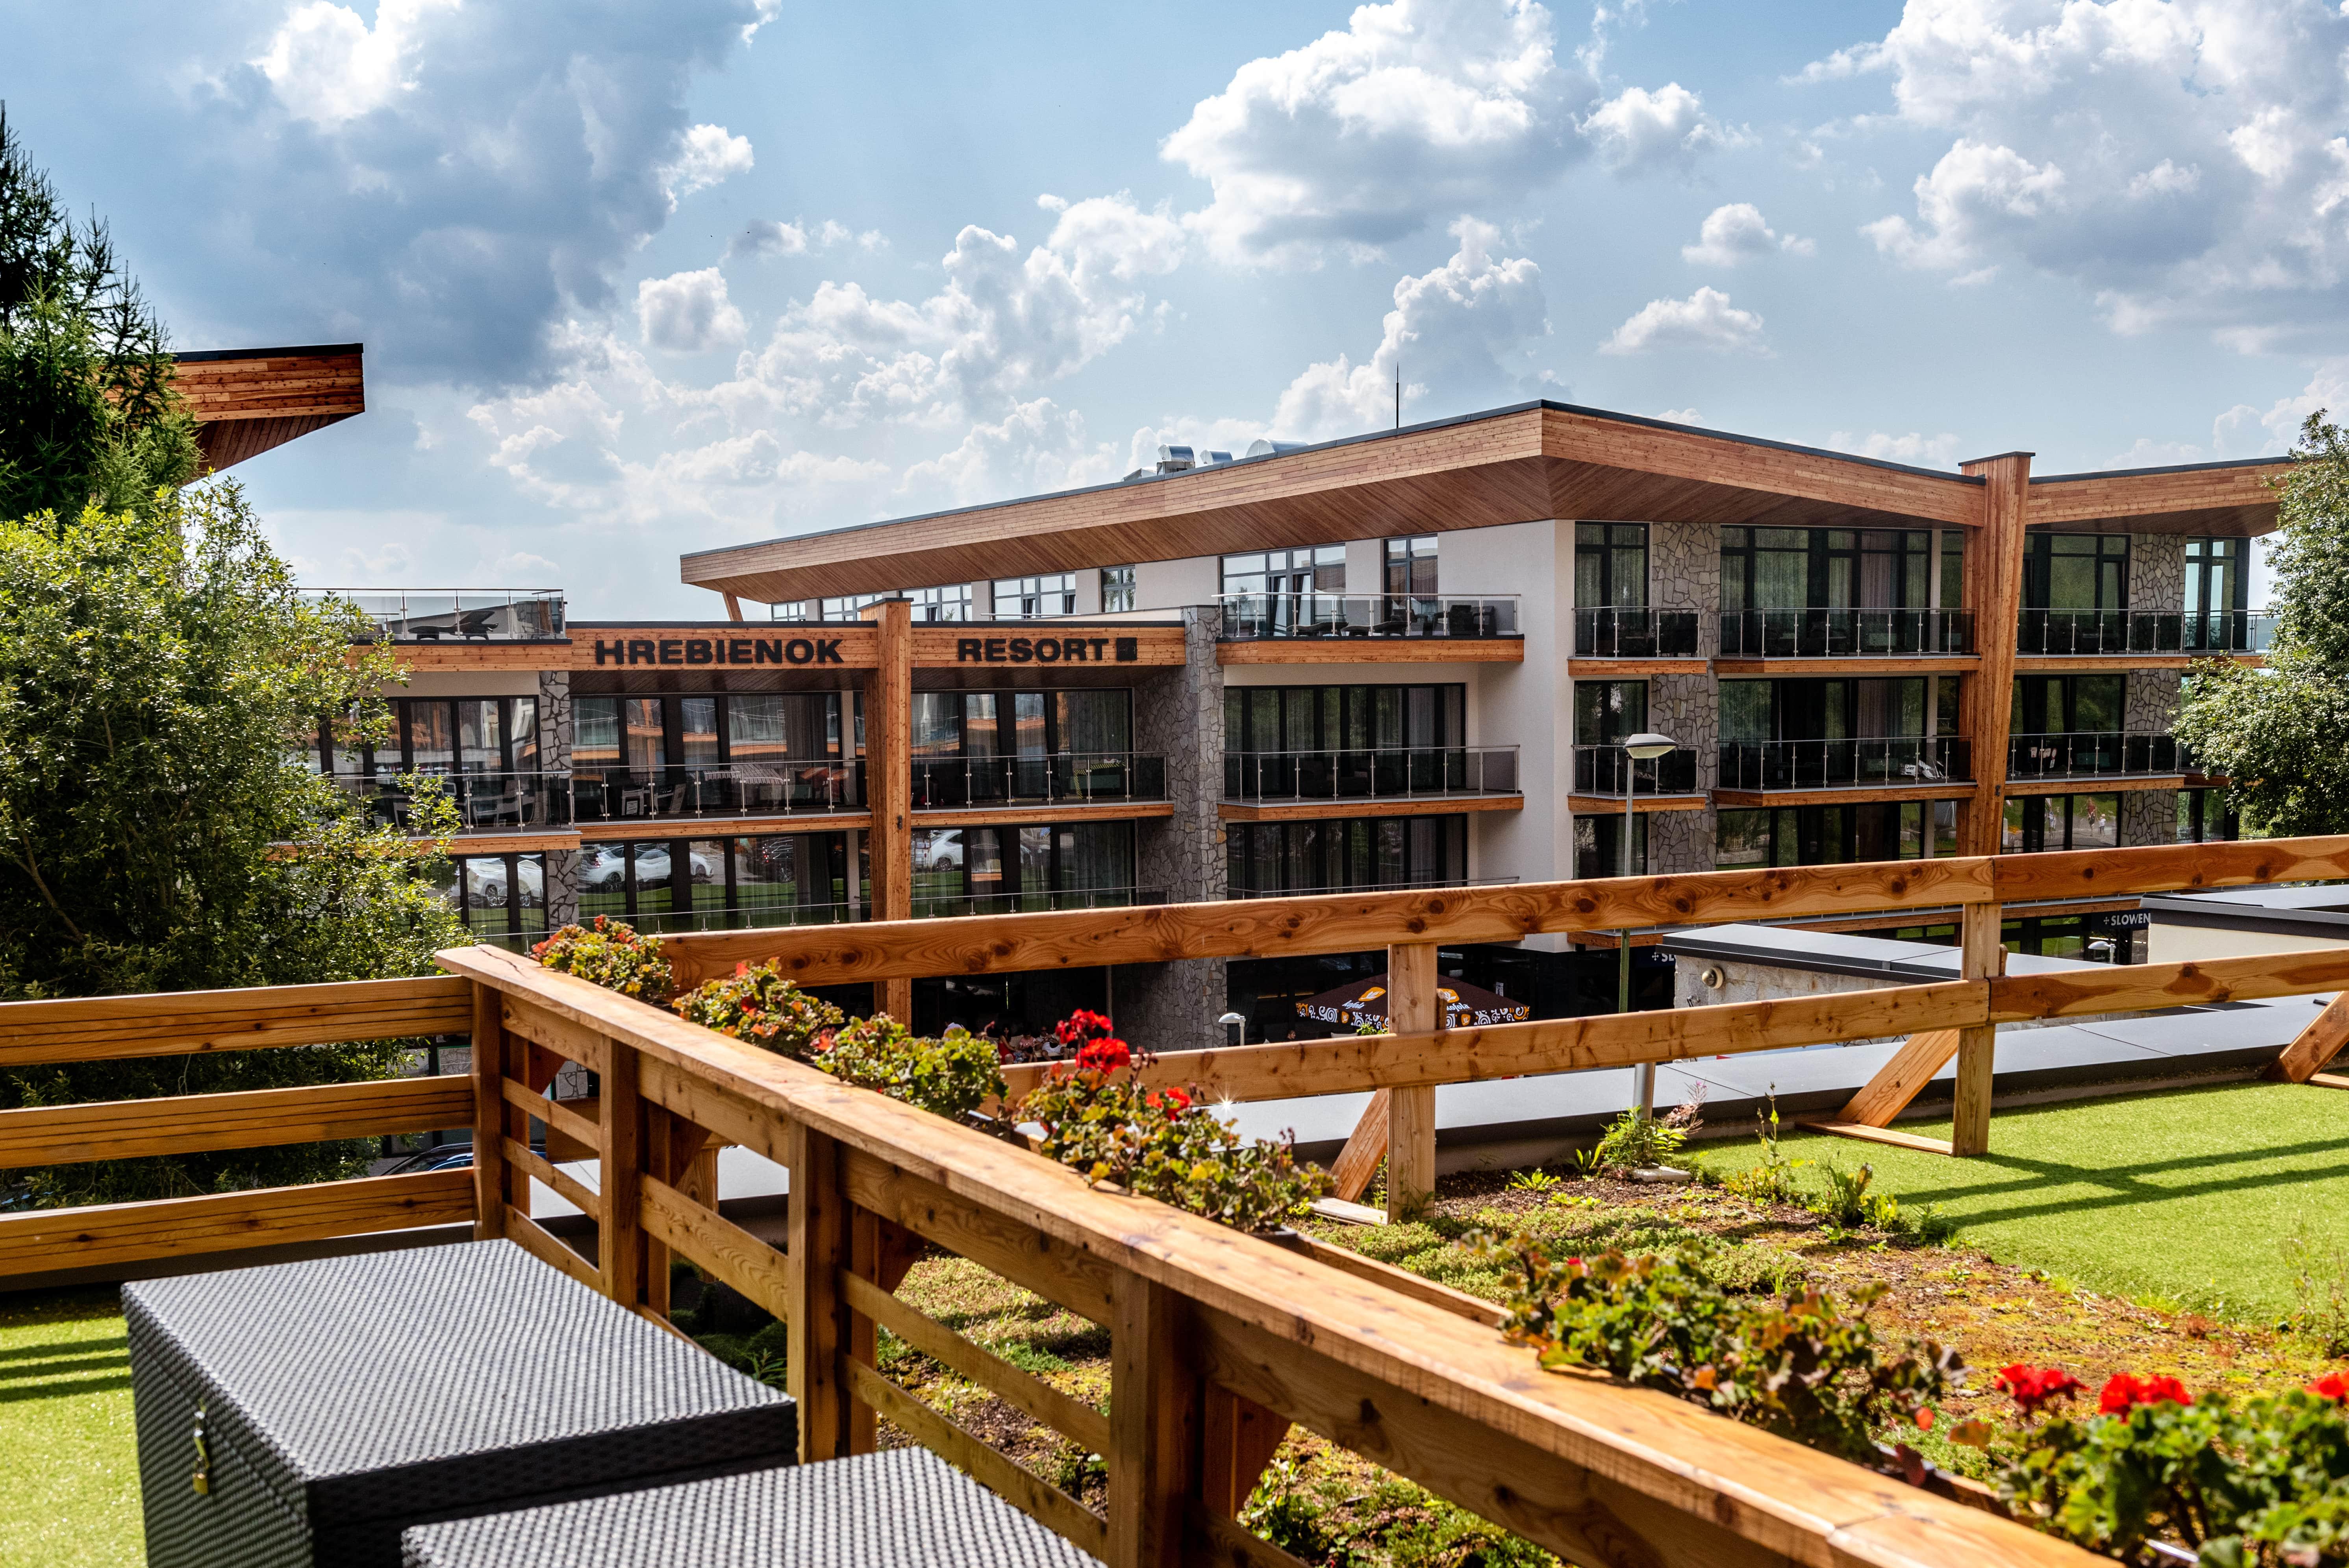 Hrebienok Hotel Resort